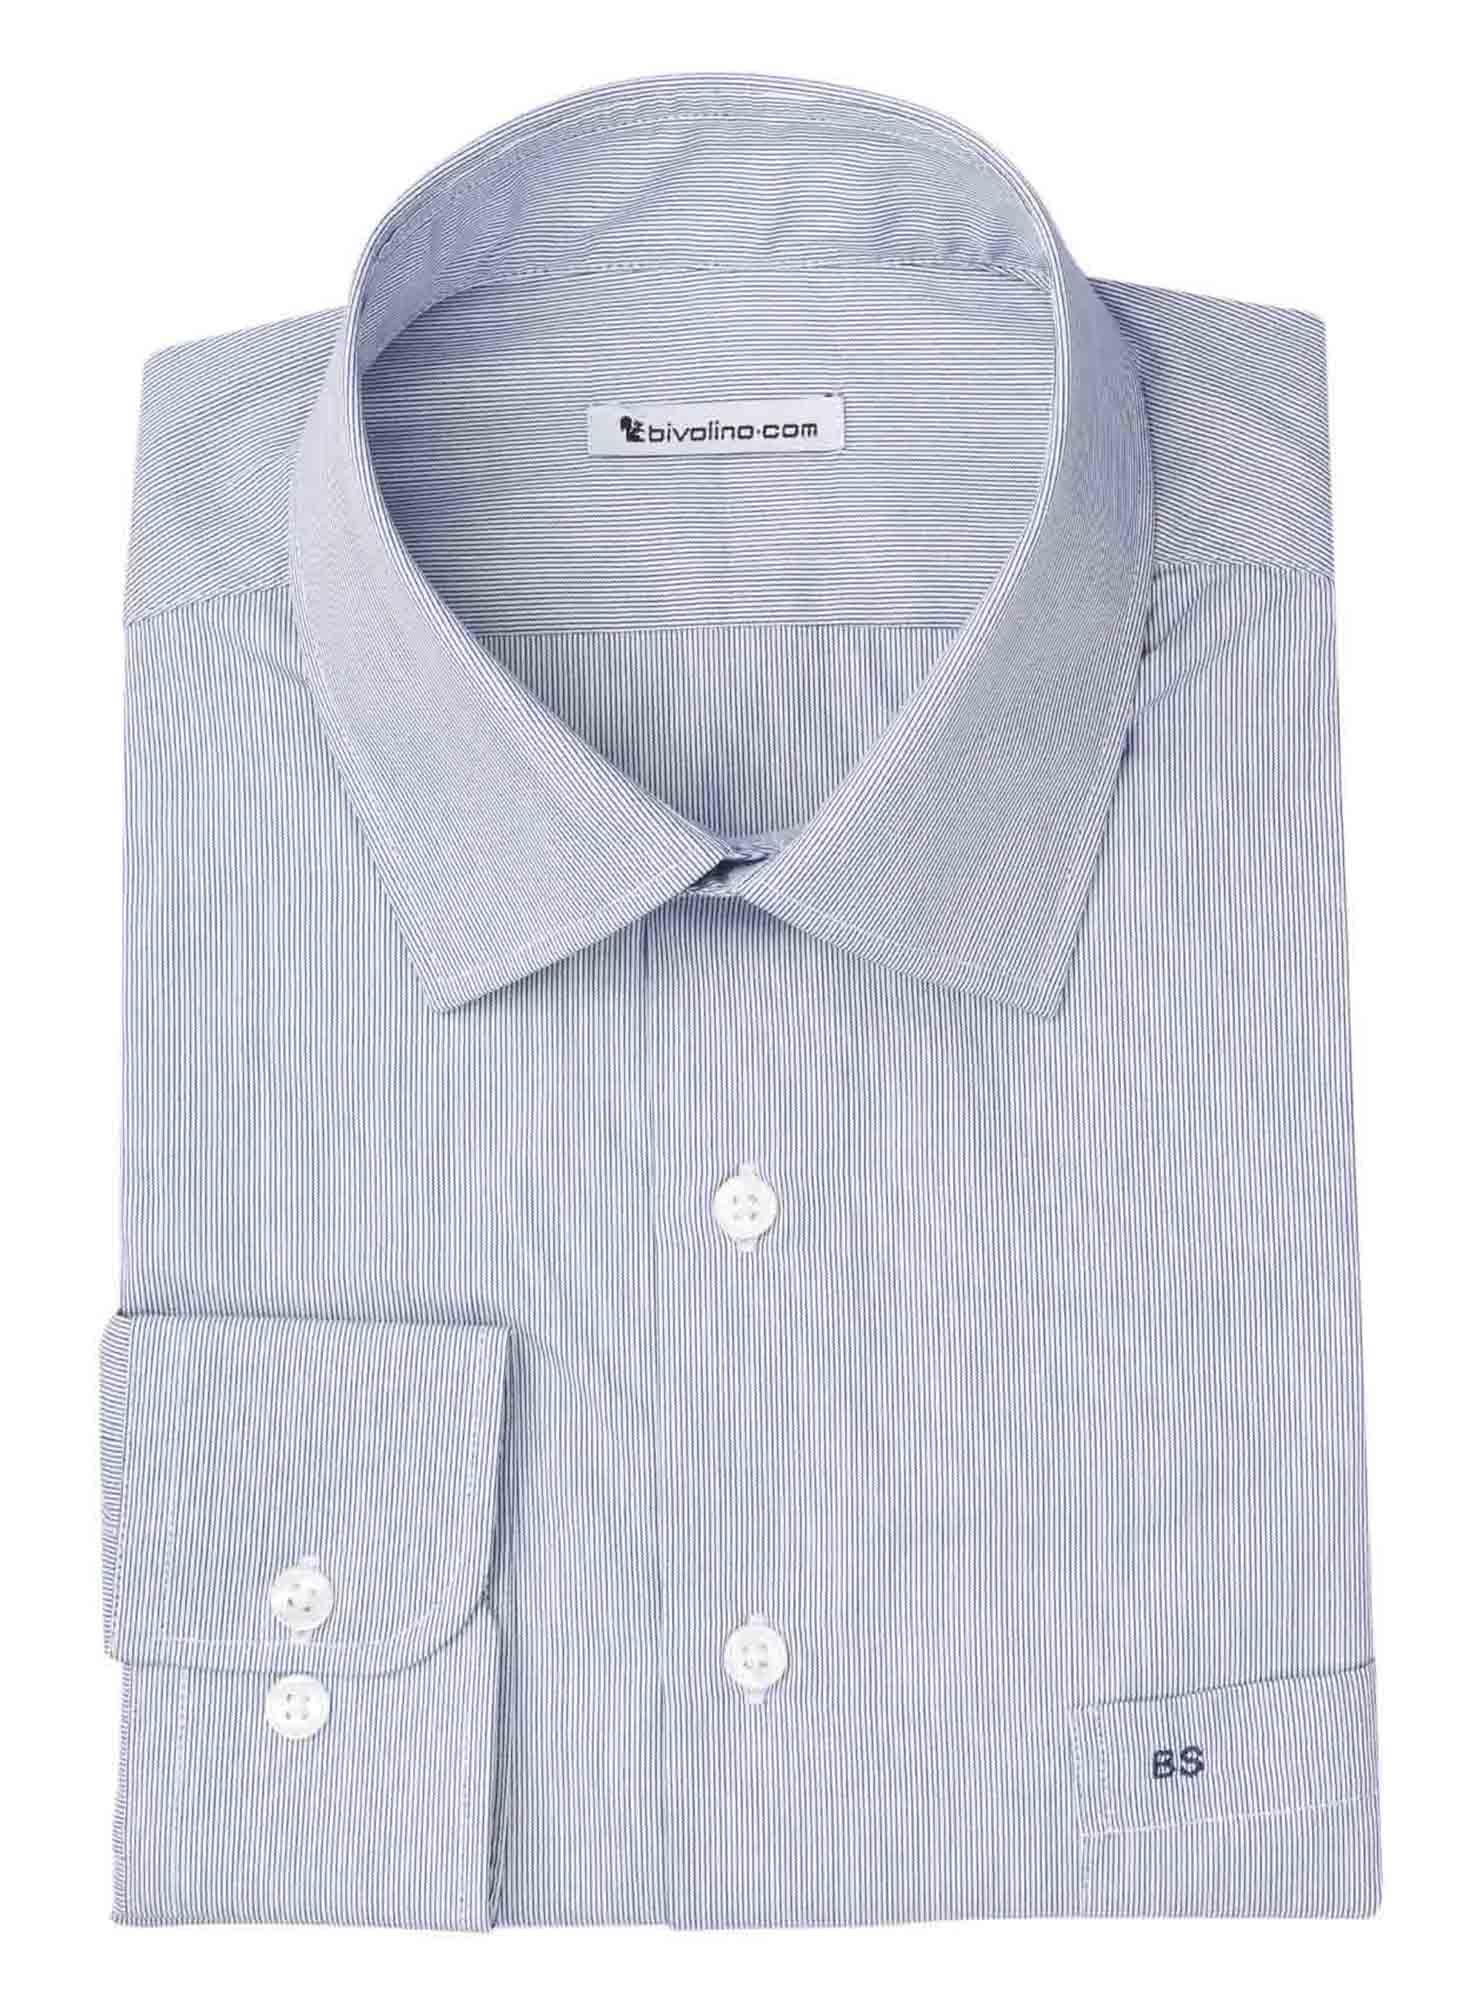 PICCINELLI - Männerhemd Baumwolle  Milleraie - TUFO 5